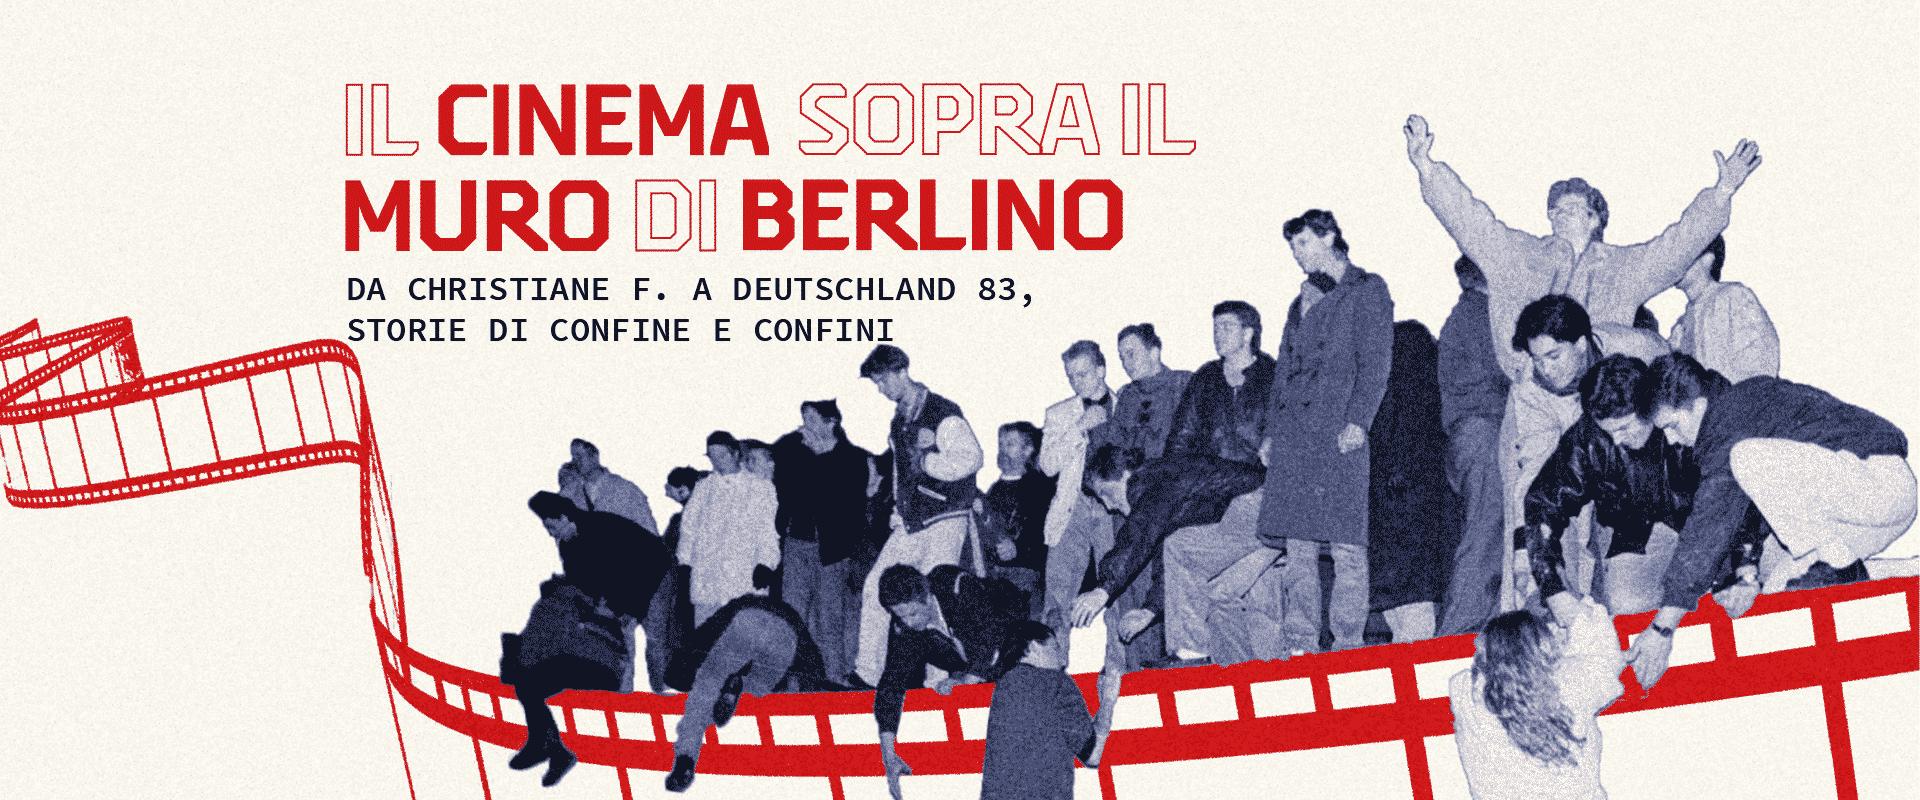 Magazine Taxidrivers Dossier Cinema Berlino